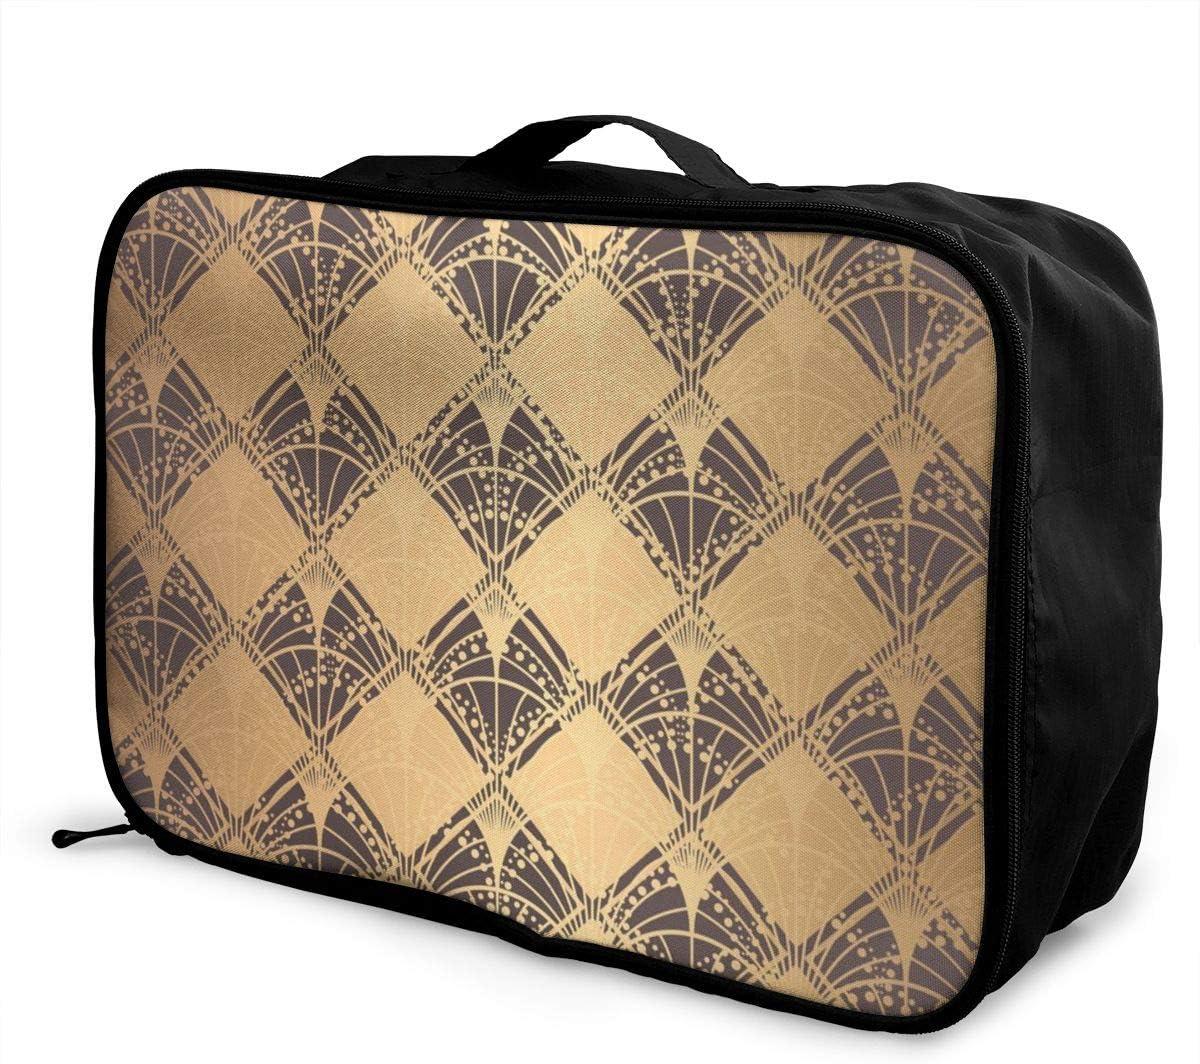 Yunshm Golden Irregular Decorative Patterns Customized Trolley Handbag Waterproof Unisex Large Capacity For Business Travel Storage